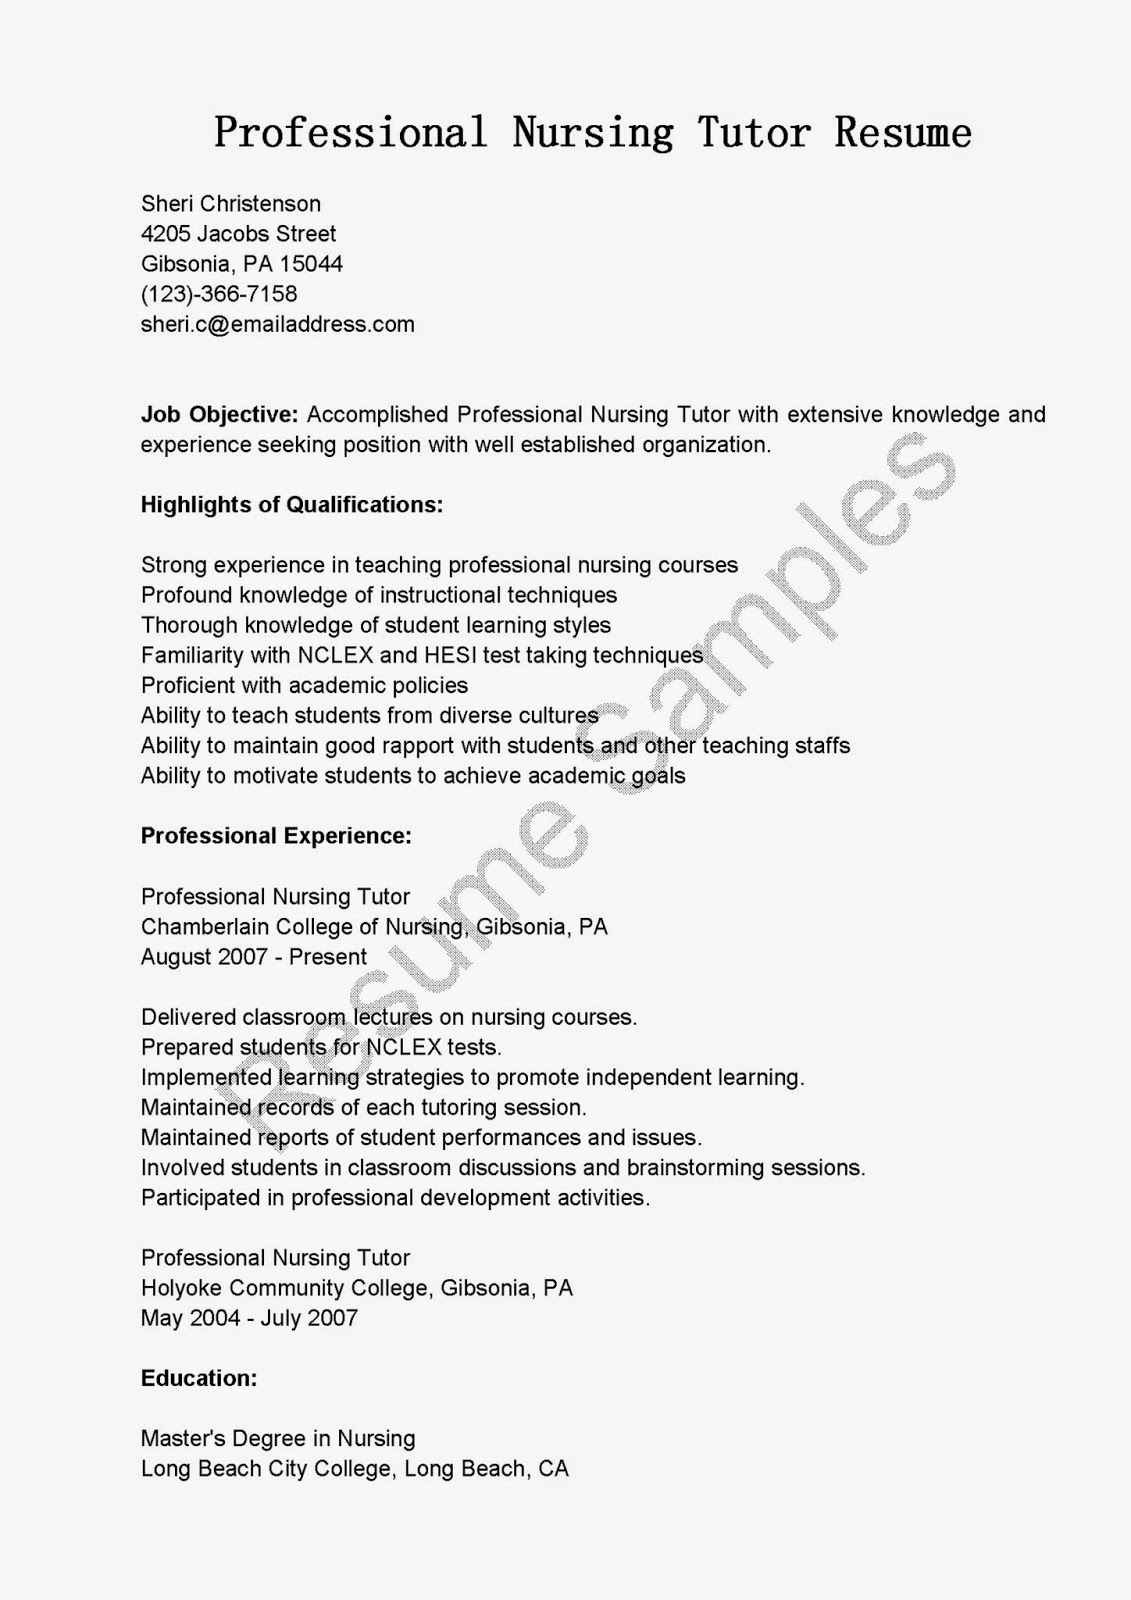 Resume Samples Professional Nursing Tutor Resume Sample